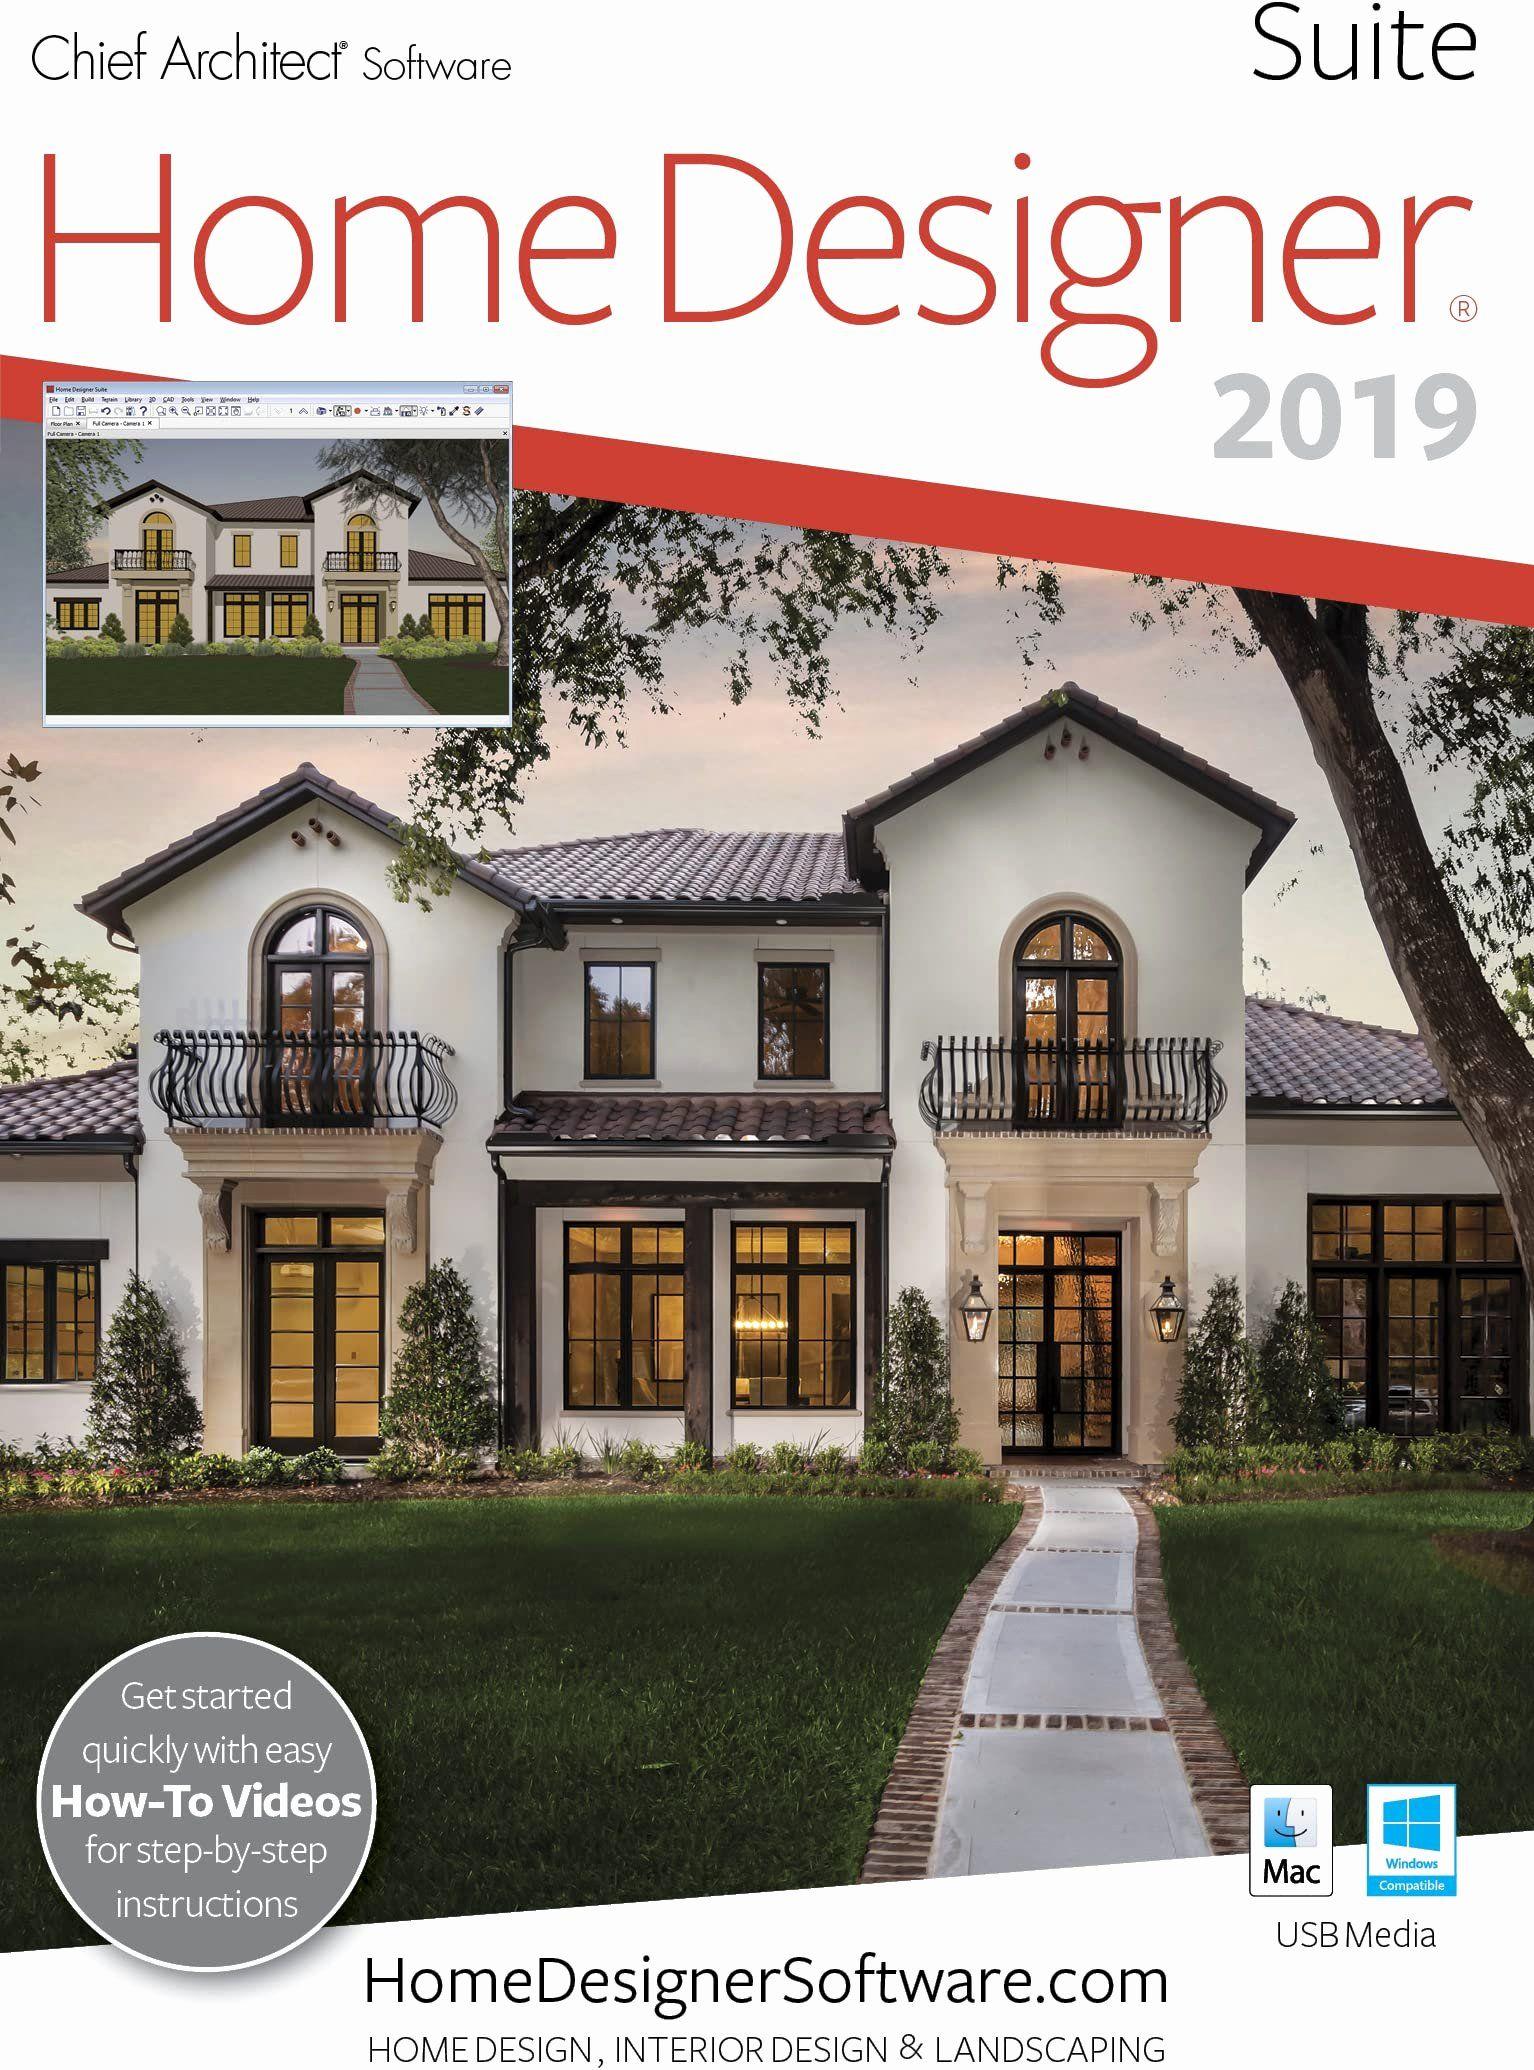 Home Designer Suite 2015 Full Version Free Download New Home Designer Suite 2019 Mac Download Down Home Designer Suite Home Design Software Architect Software